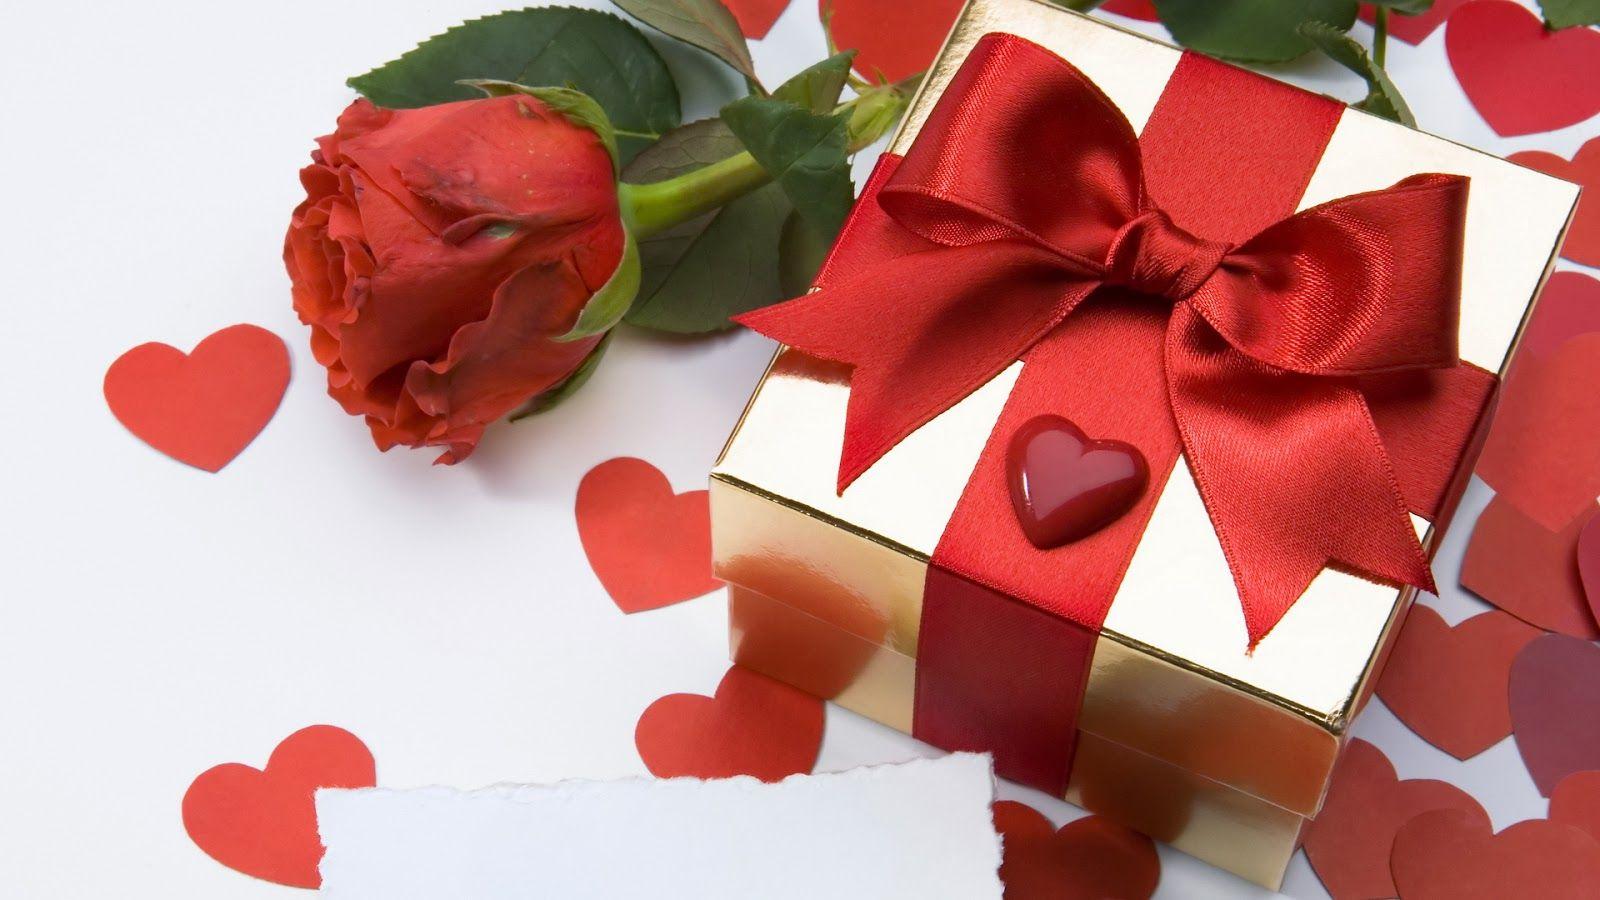 Valentines special send beautiful fresh flowers to your love valentines special send beautiful fresh flowers to your love ones anywhere in india izmirmasajfo Gallery